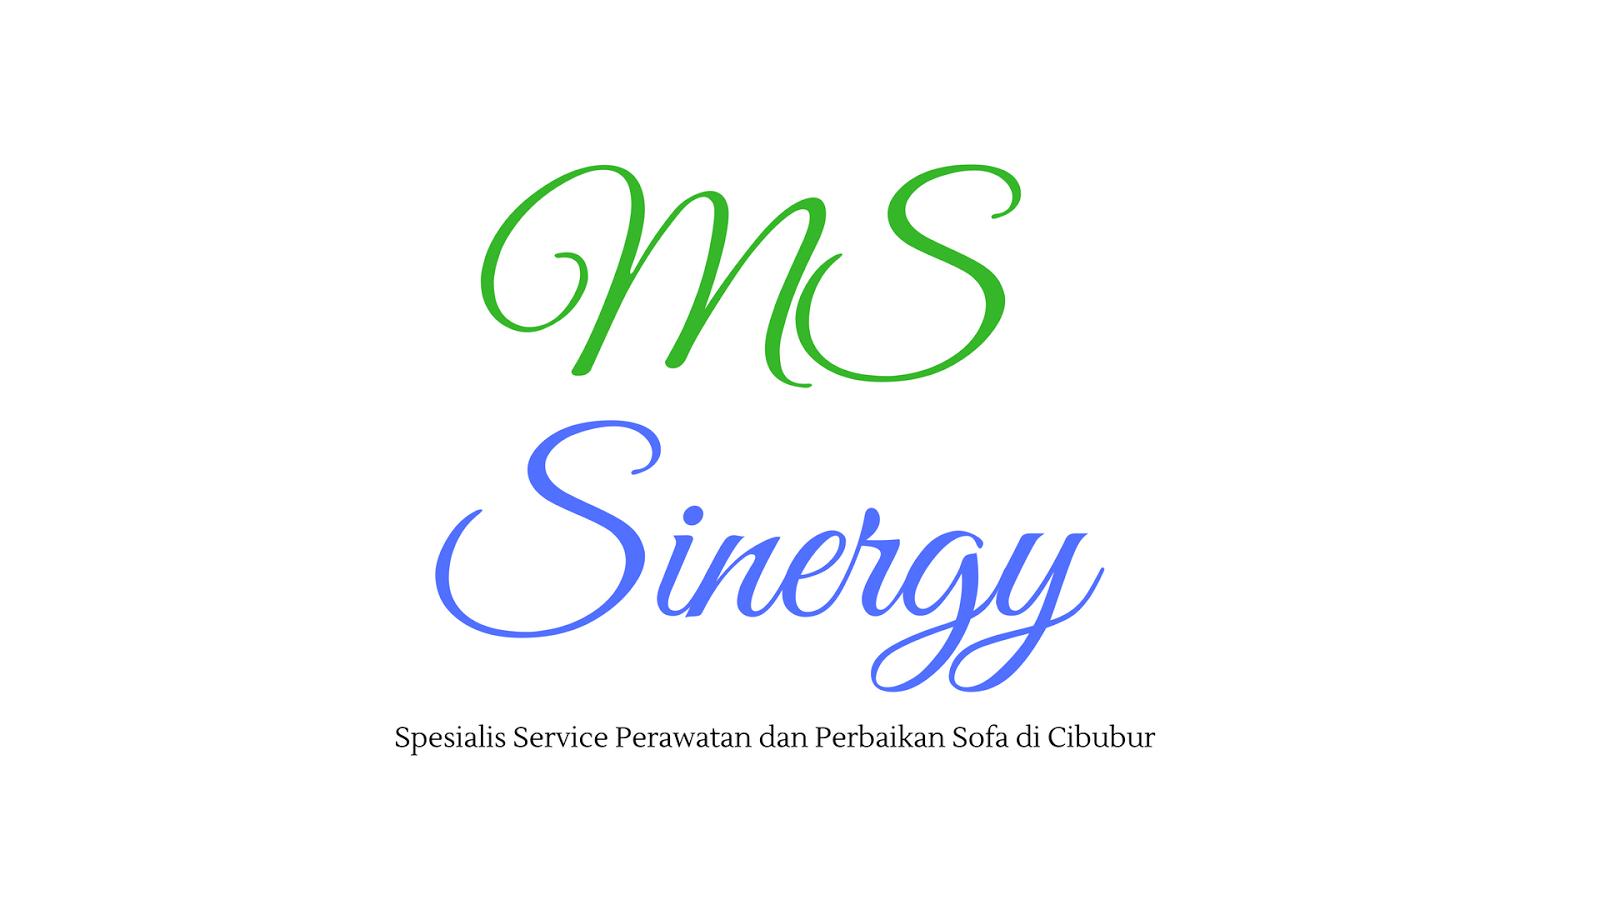 Sinergy Service | Service Perbaikan dan Perawatan Sofa di Cibubur